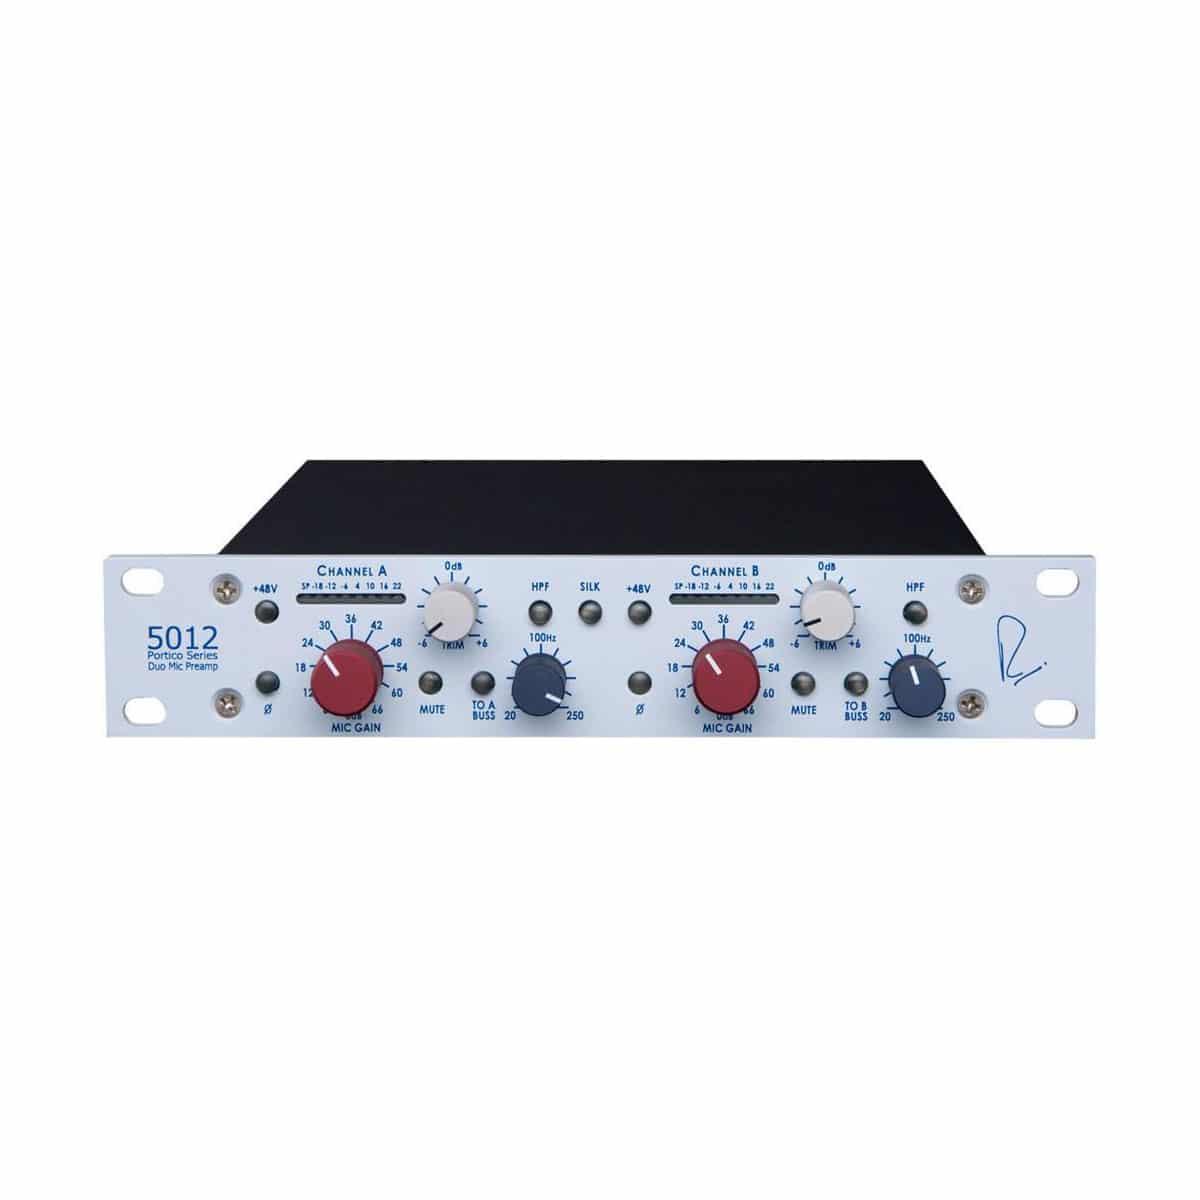 Rupert Neve Portico 5012 01 Pro Audio, Outboard, Preamplificatori Microfonici